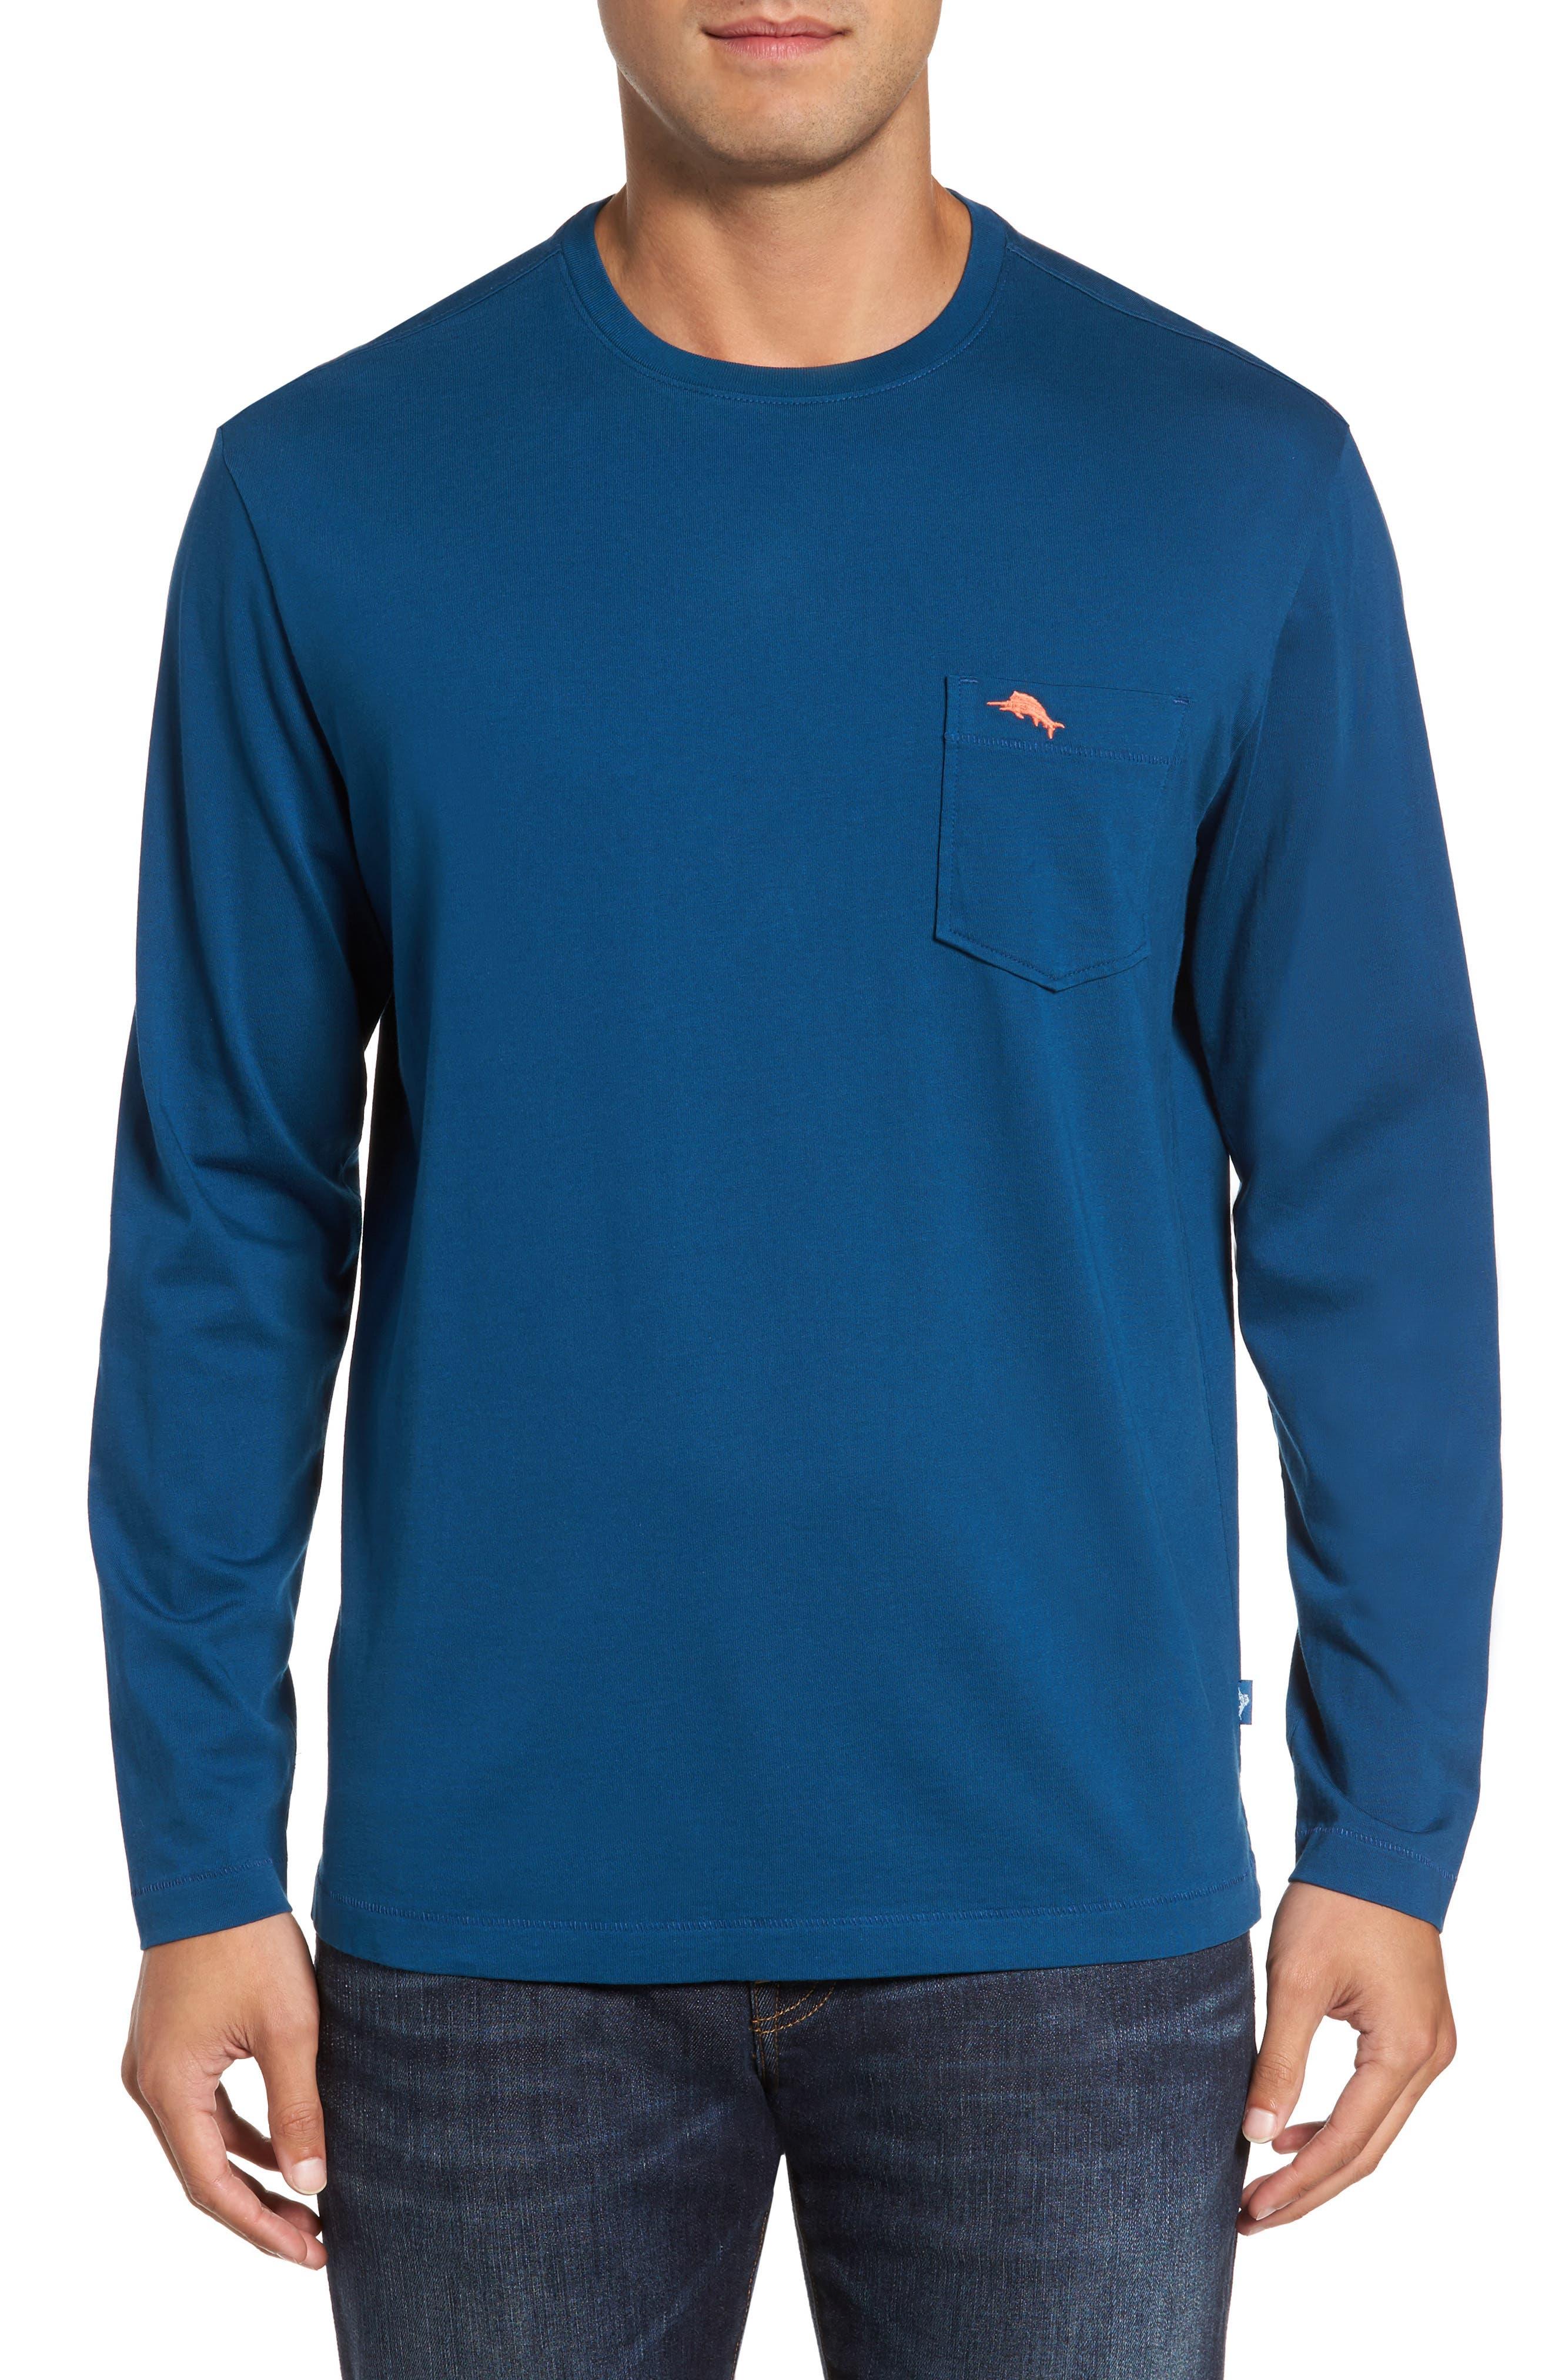 Main Image - Tommy Bahama 'Bali Skyline' Long Sleeve Pima Cotton T-Shirt (Big & Tall)